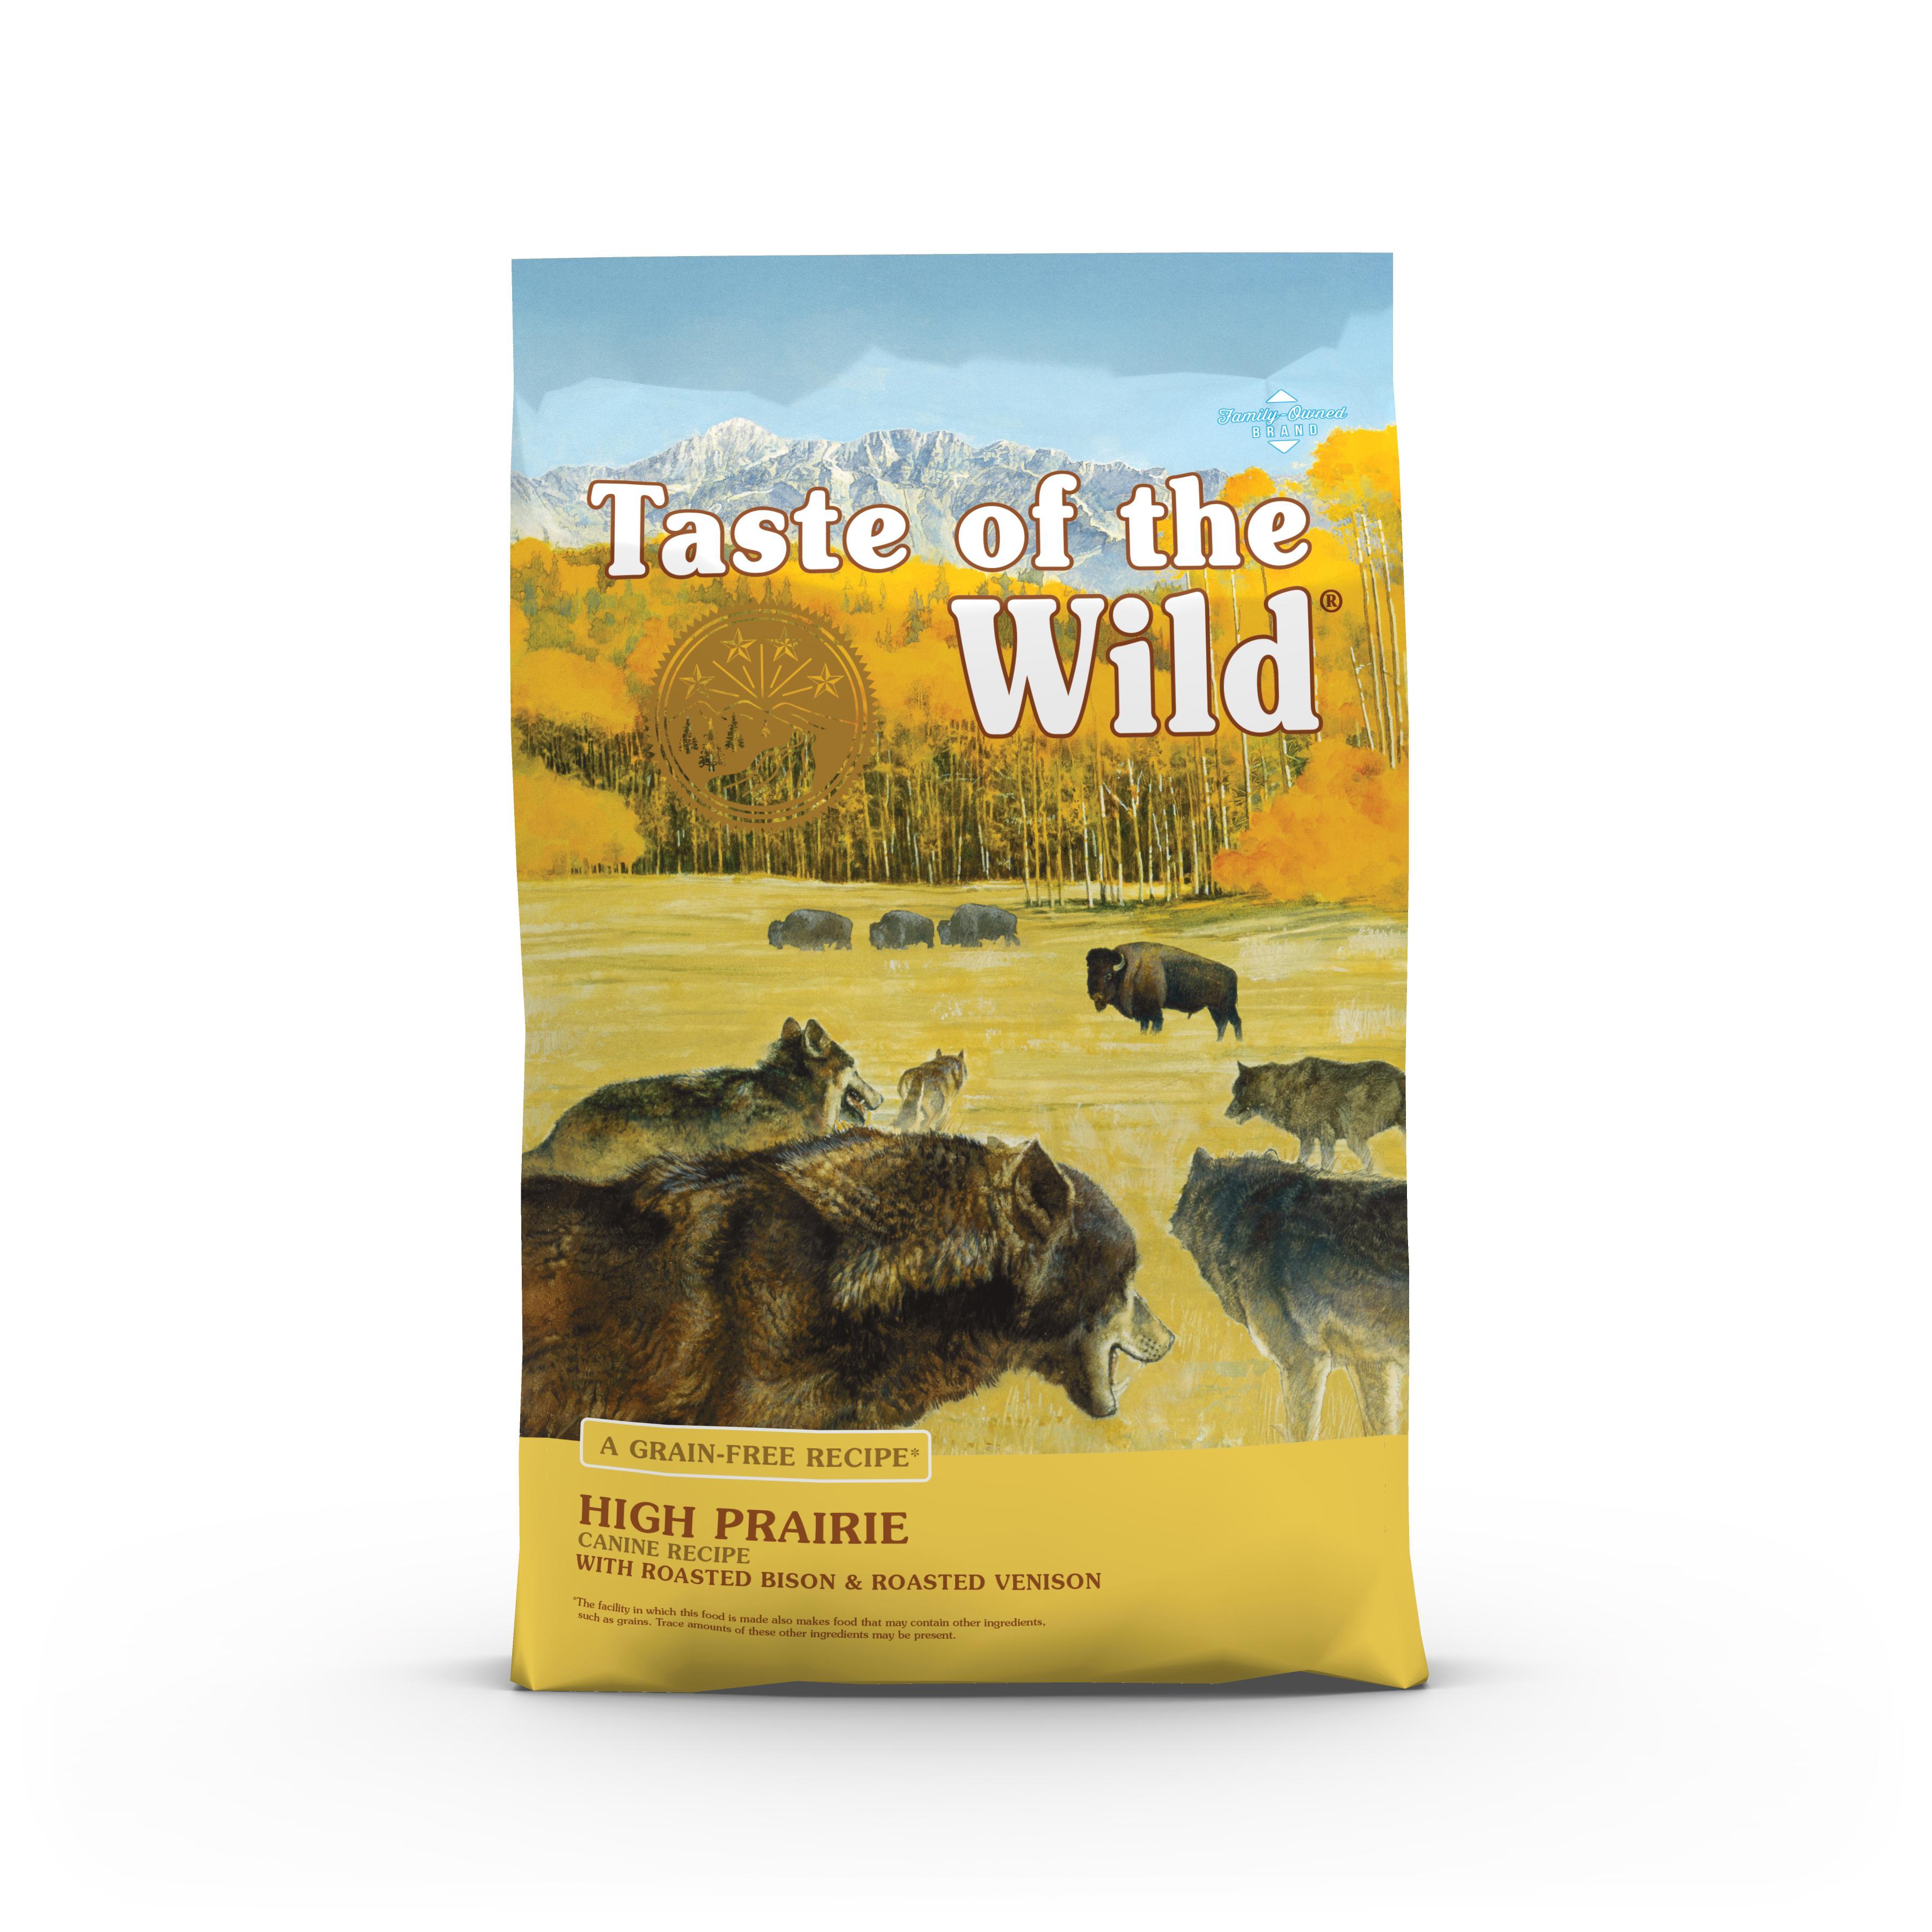 Taste of the Wild High Prairie Grain-Free Dry Dog Food, 14-lb